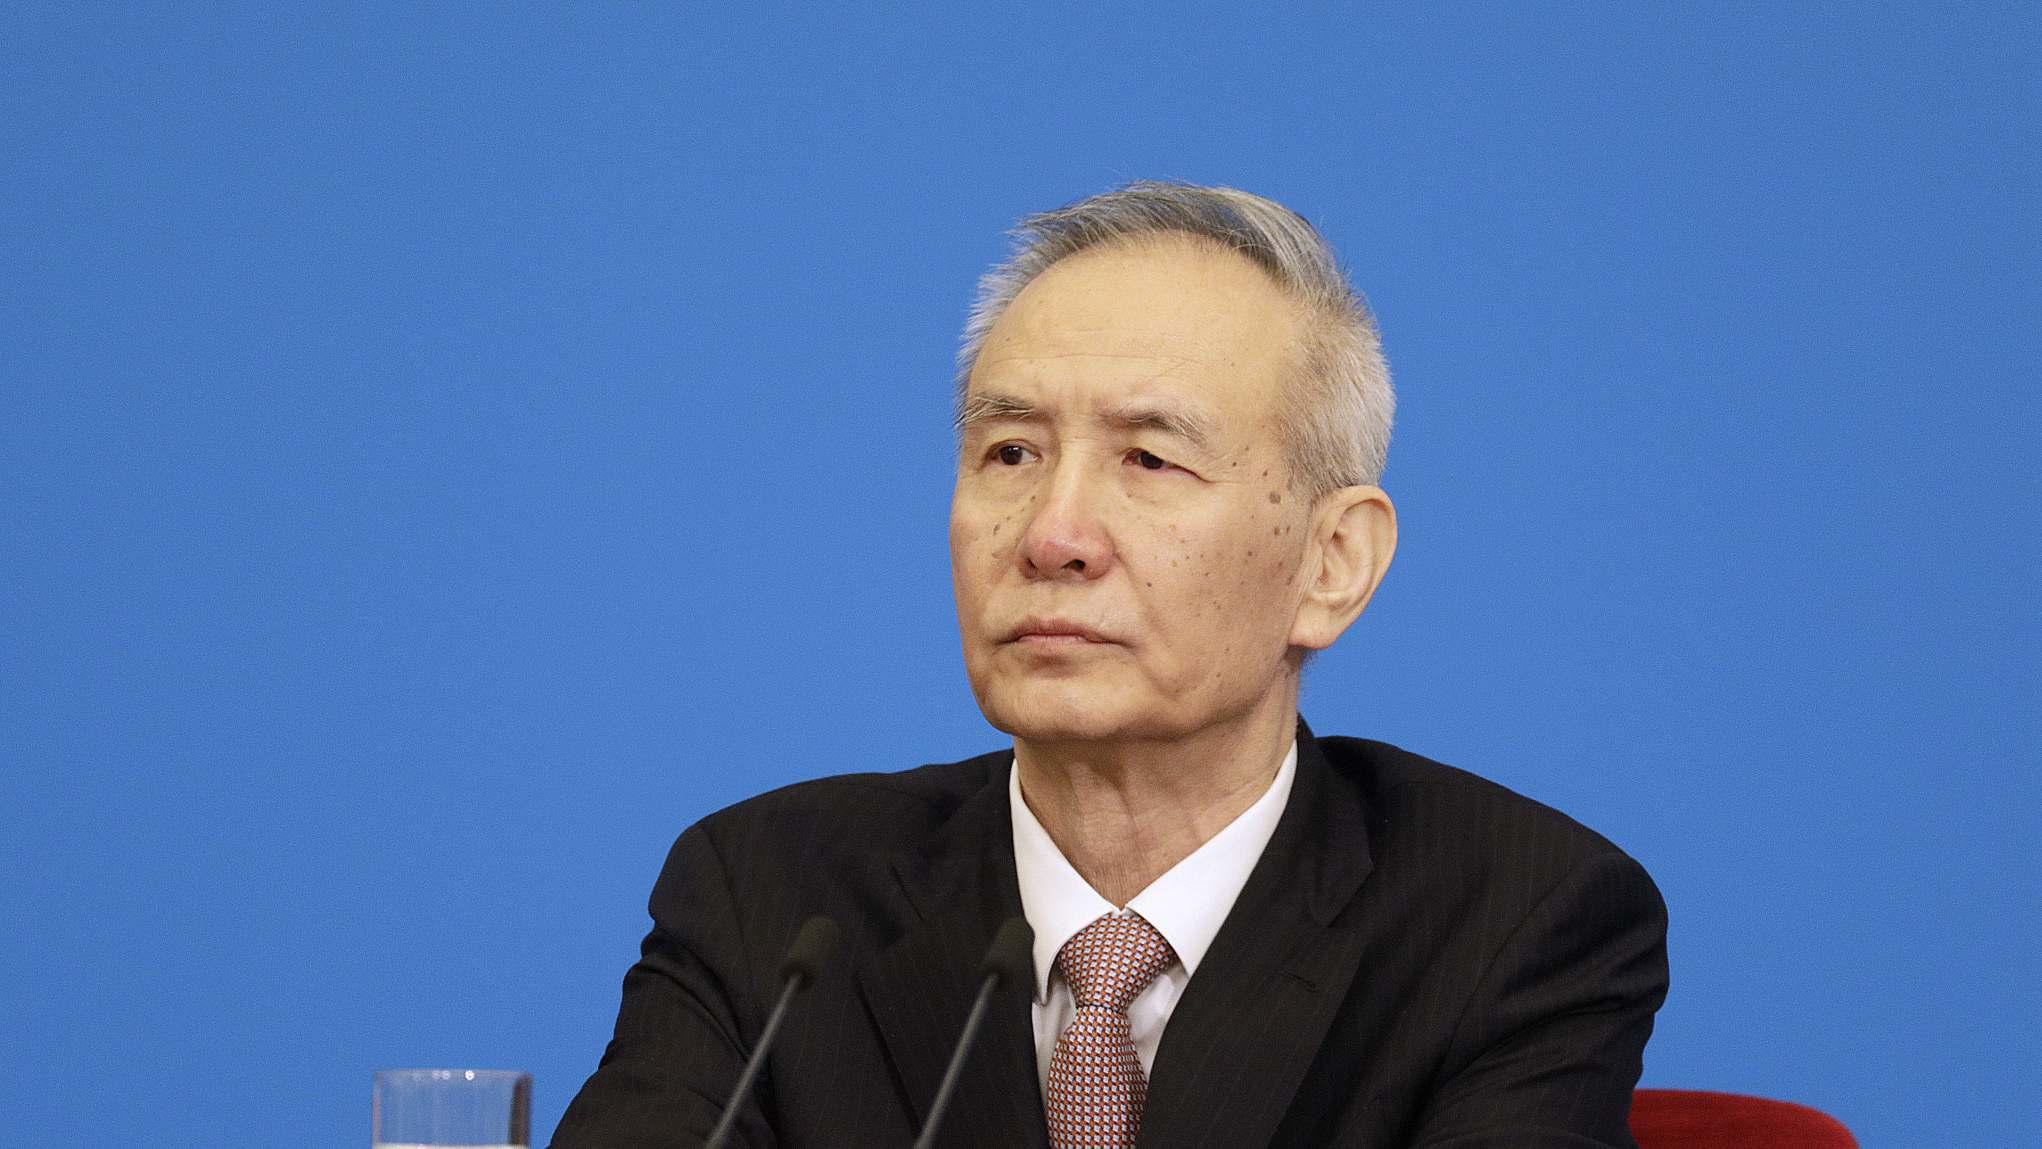 Chinese vice premier meets U.S. senators